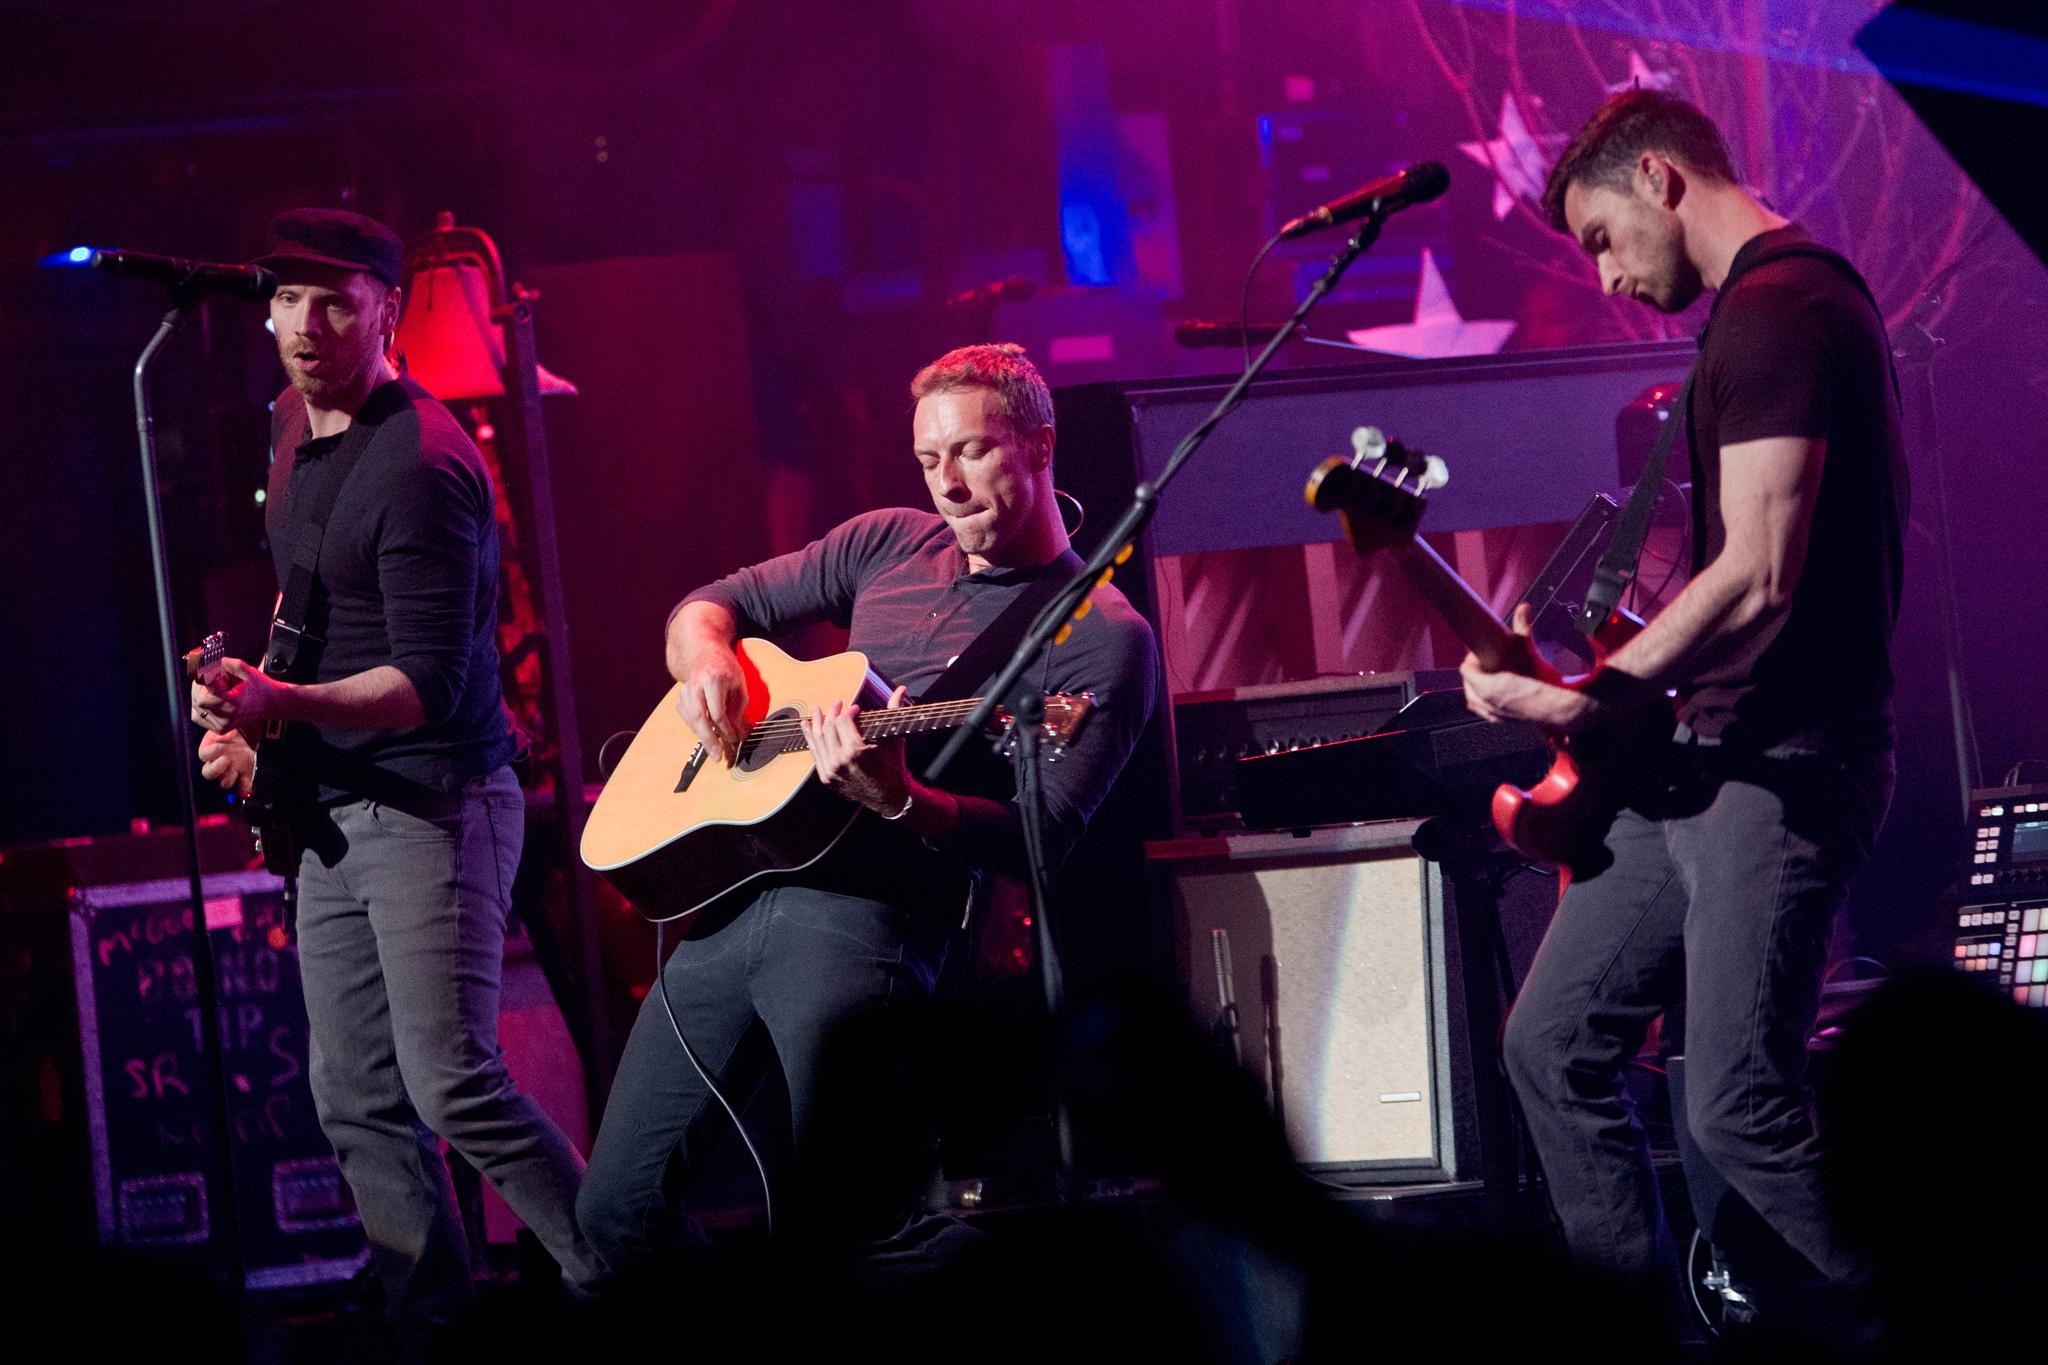 Coldplay at MetLife Stadium